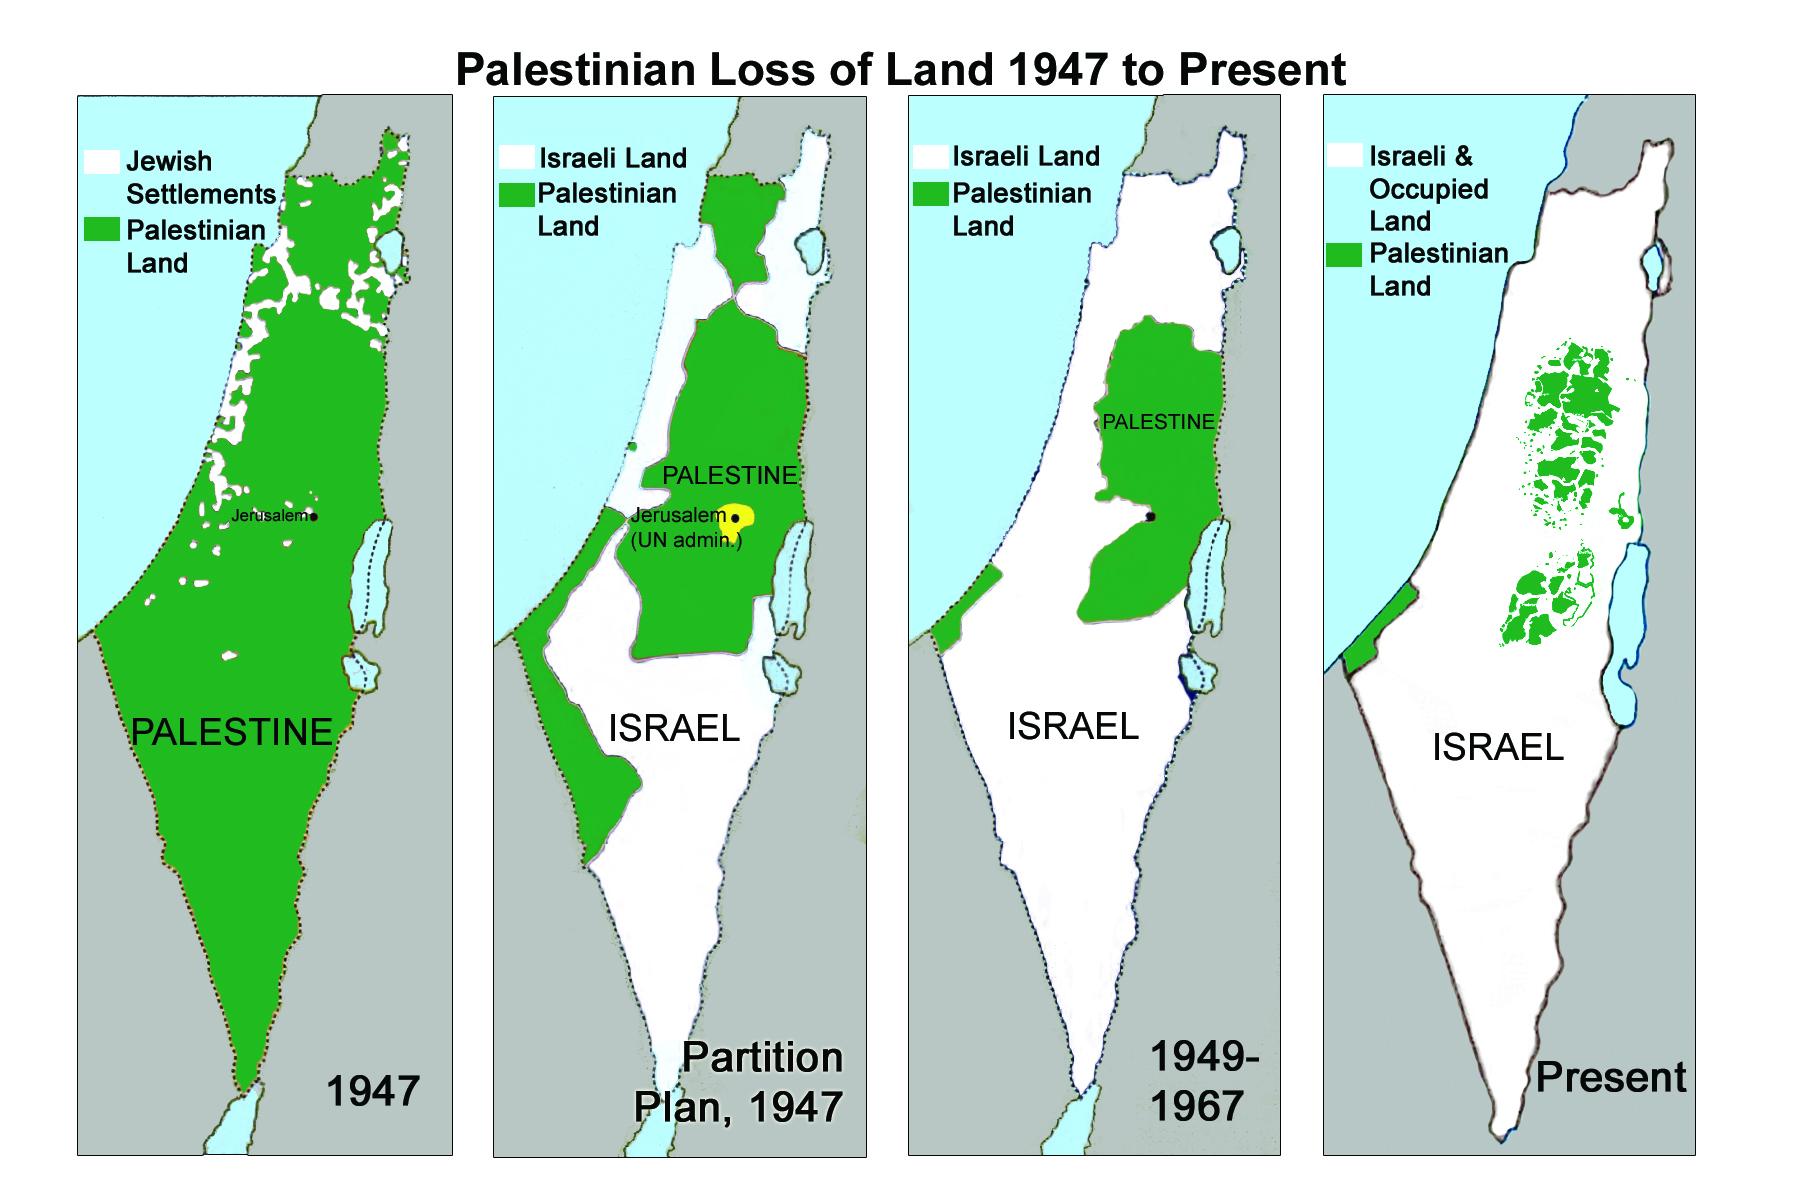 kaart_palestina_ian